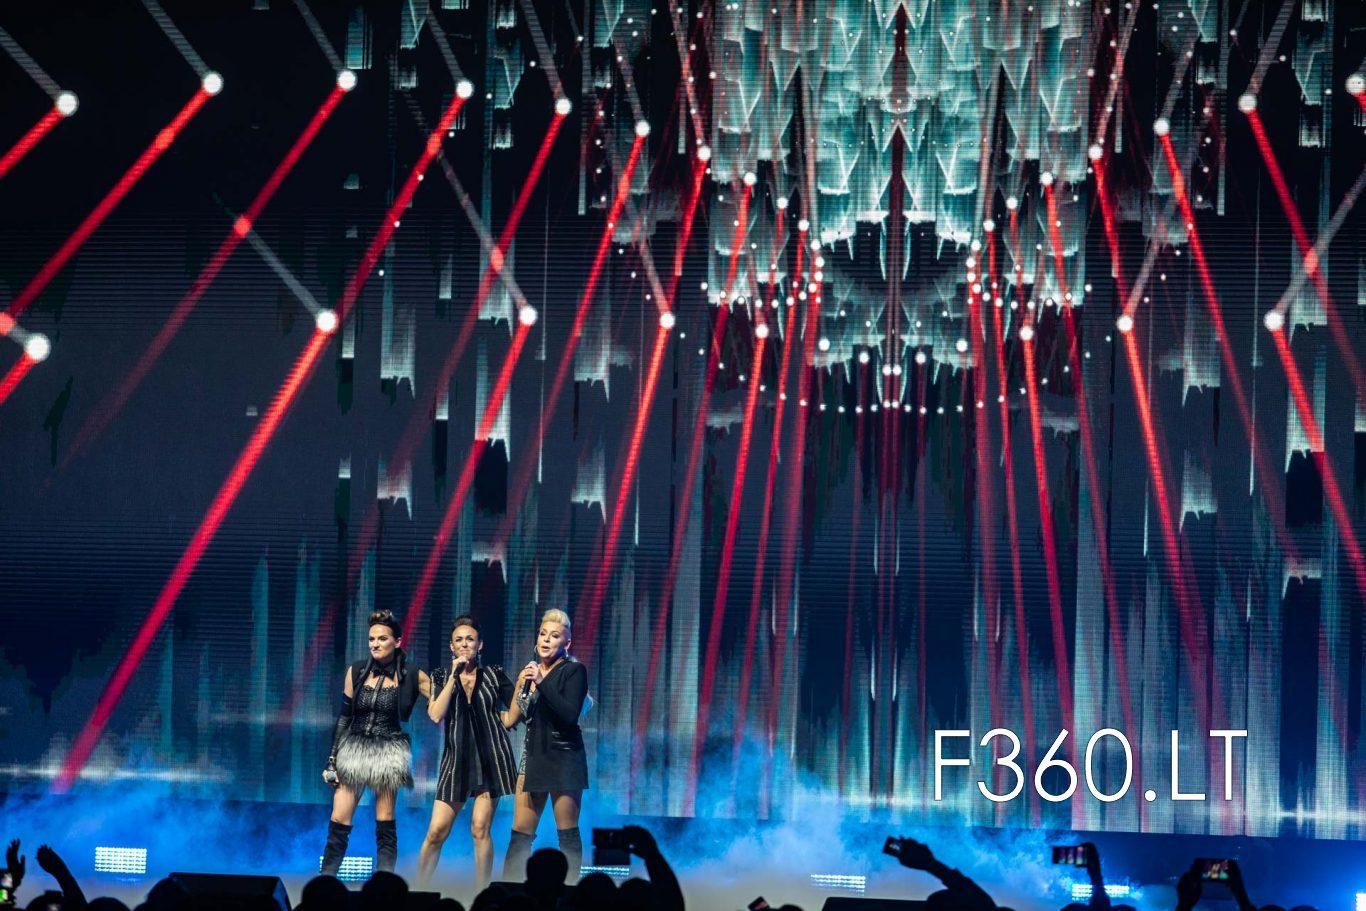 Re252 Grupes 'mango' 20 Metcio Koncertas. Klaipeda Koncertu Fotografai F360lt 3t4a5339